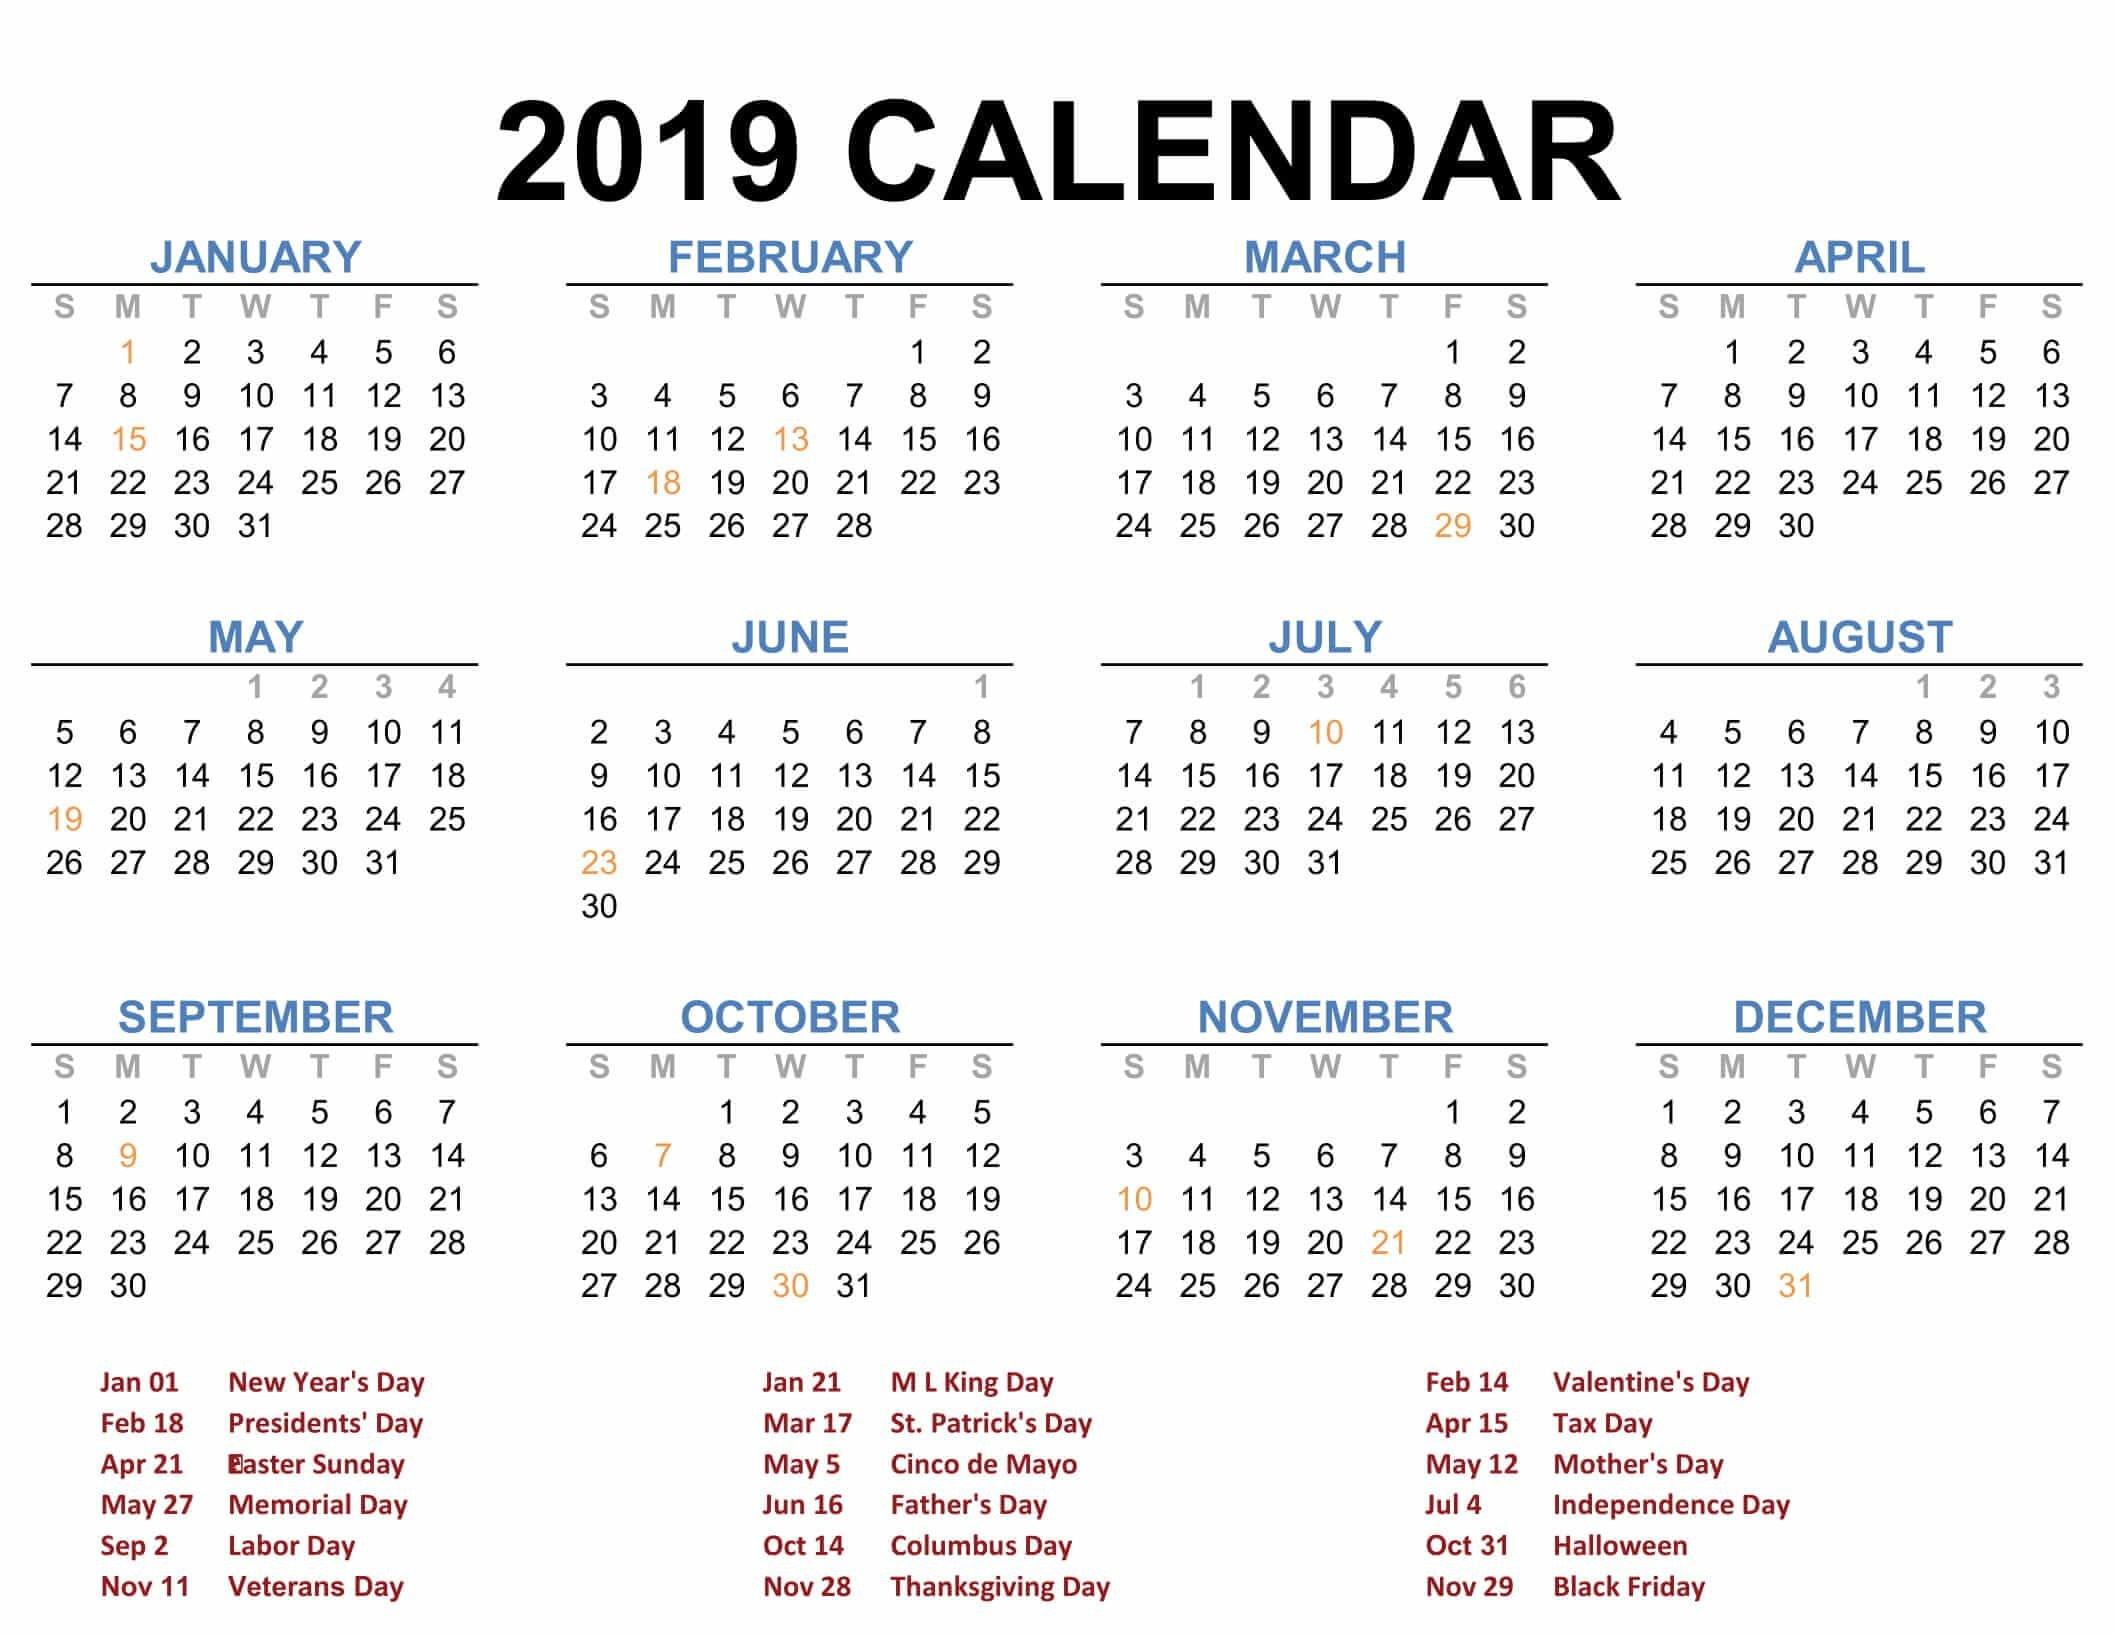 Calendar 2019 Blank Printable | ❤️creator Thyself ❤ | Printable Zeiss Calendar 2019